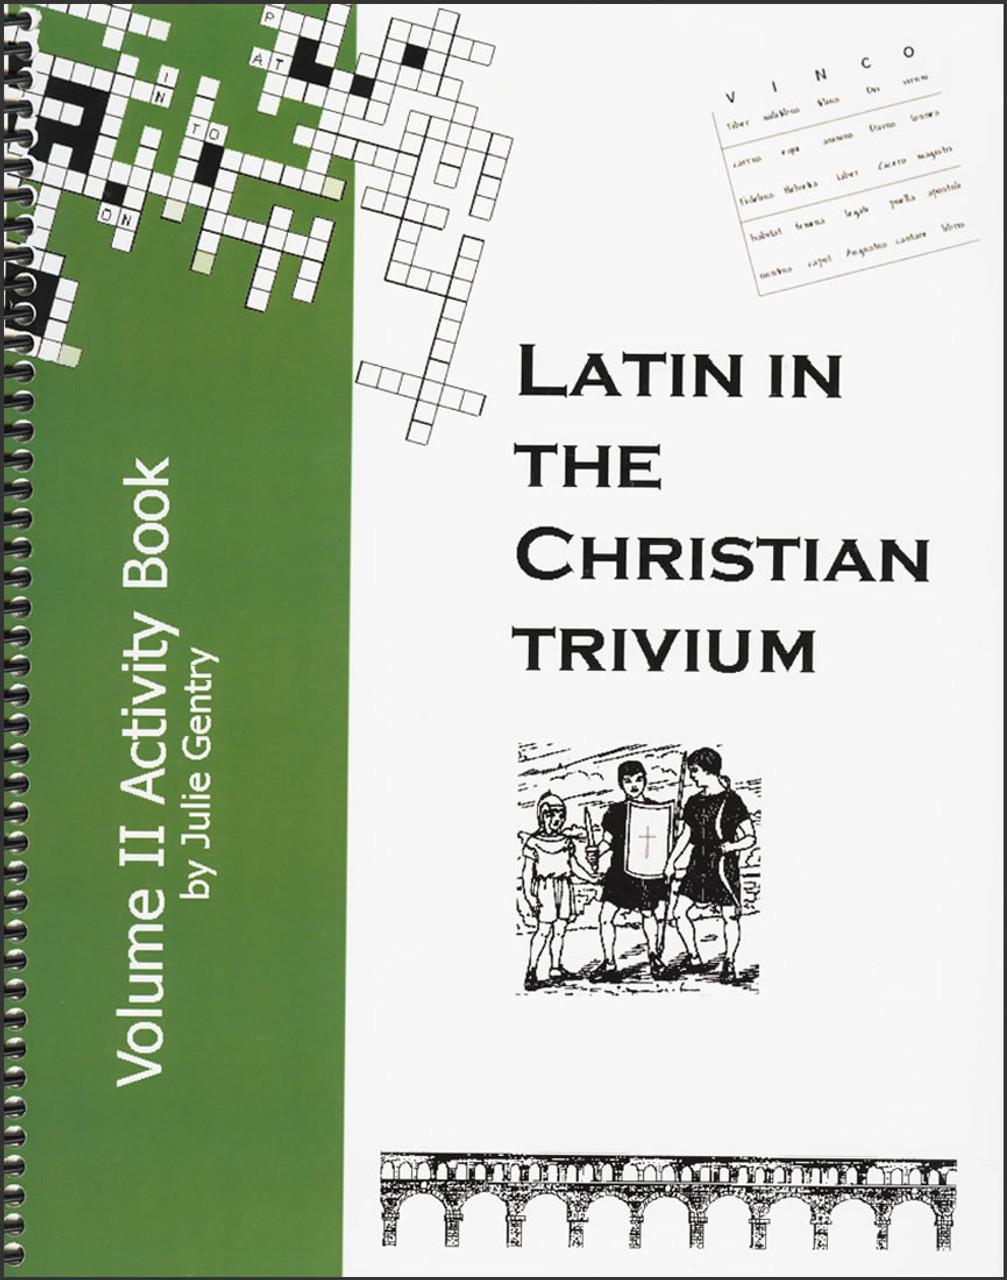 Latin in the Christian Trivium: Volume 2 - Activity Book